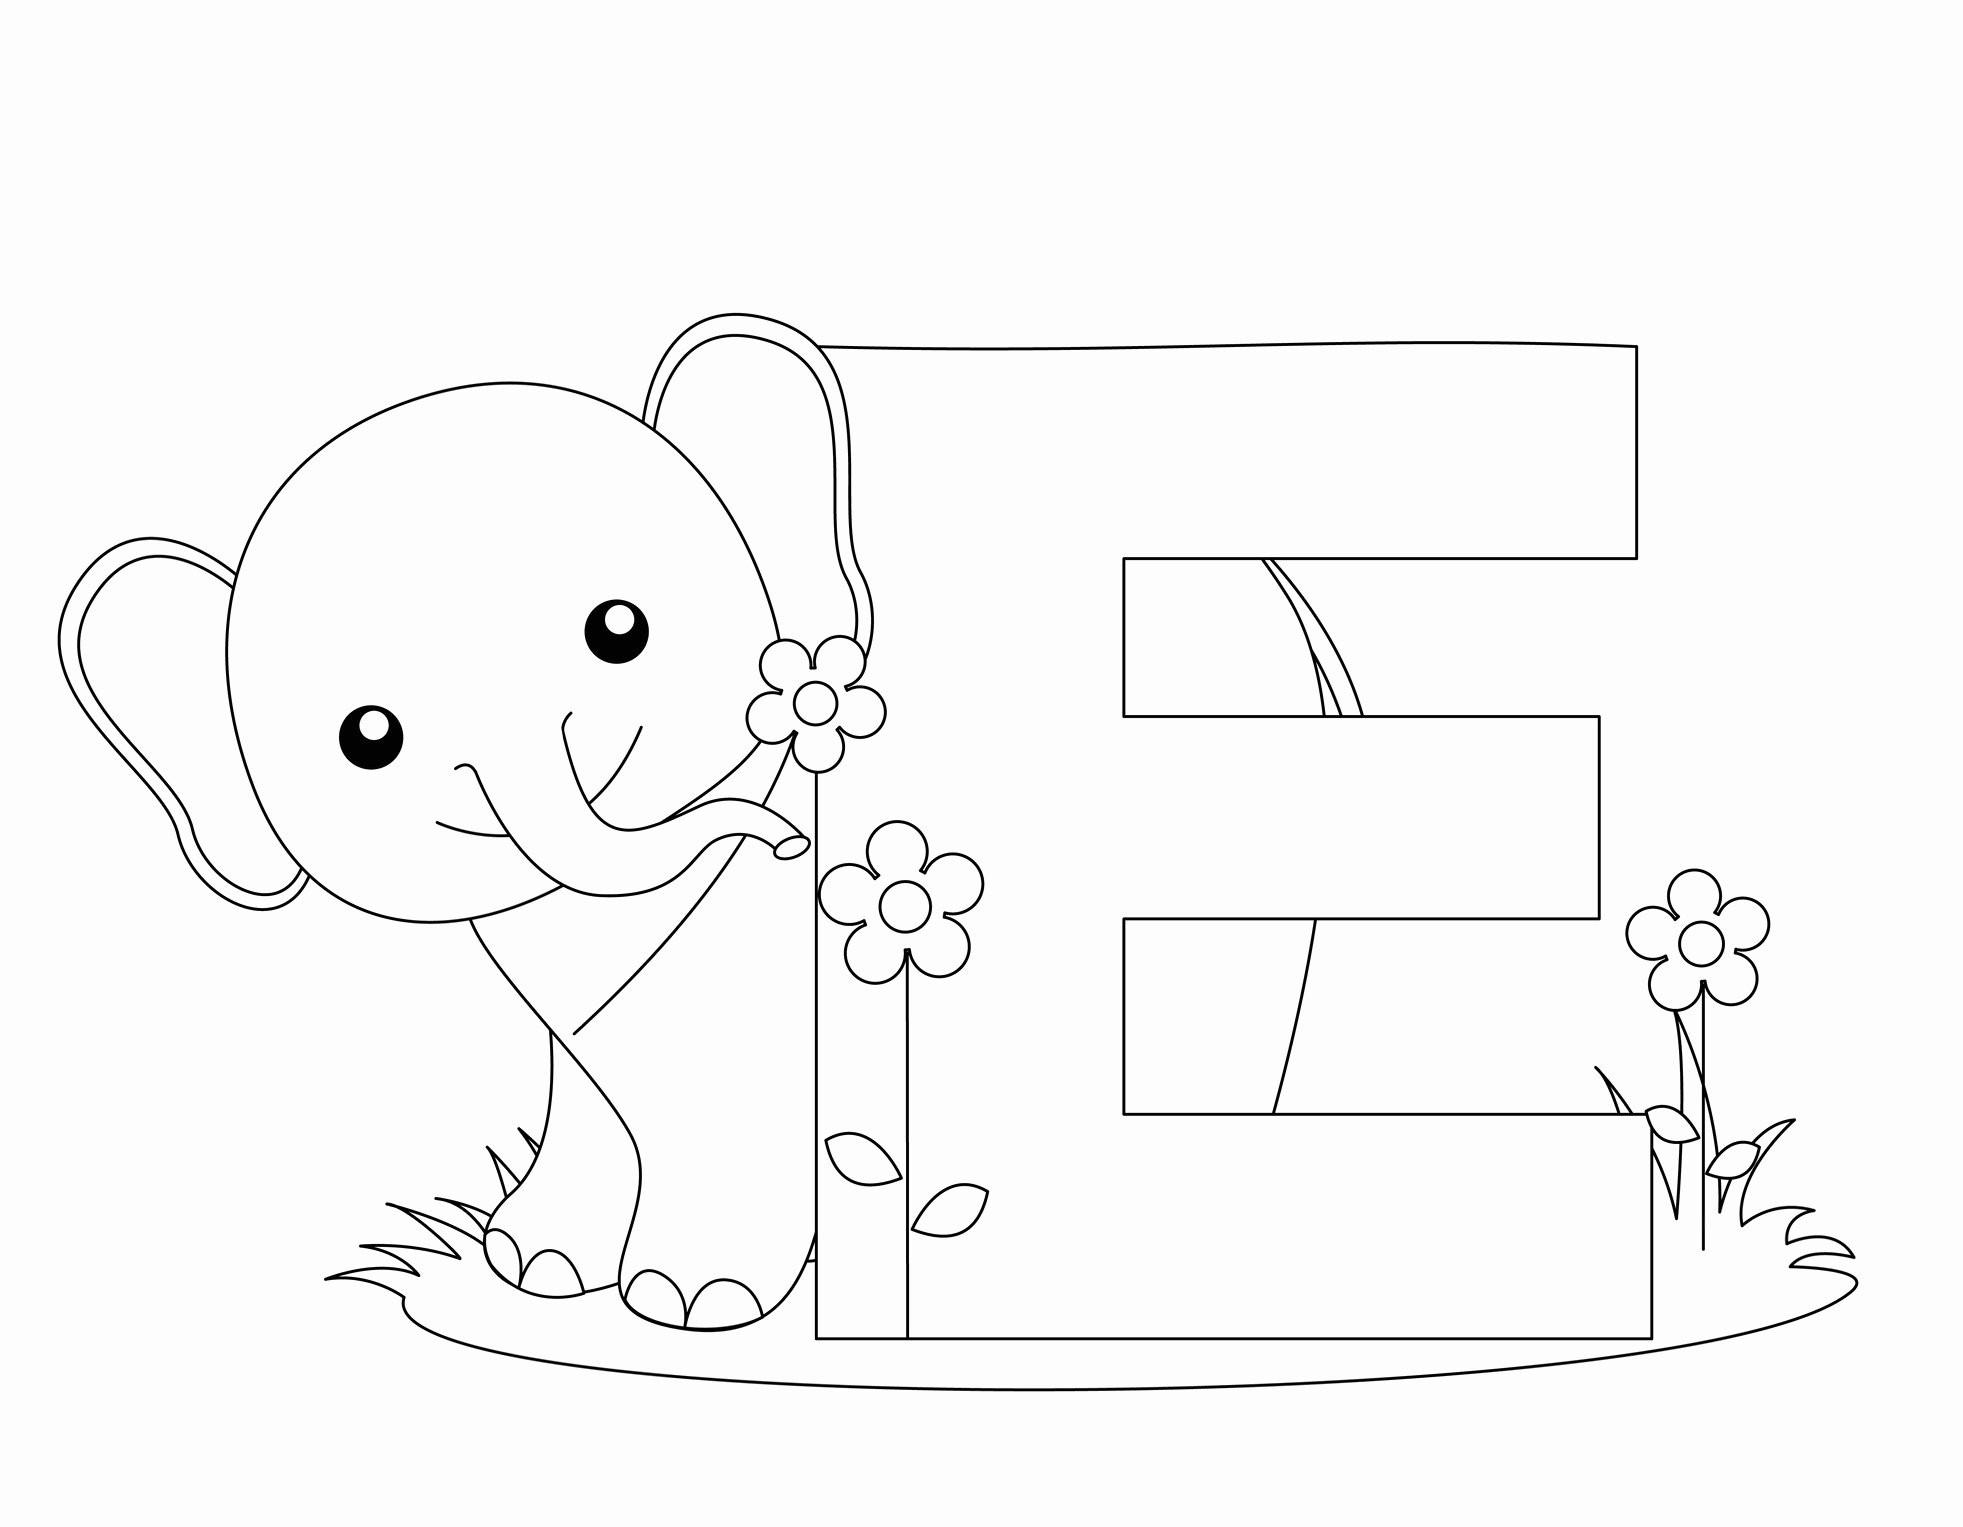 Alphabet Colouring Worksheets For Kindergarten